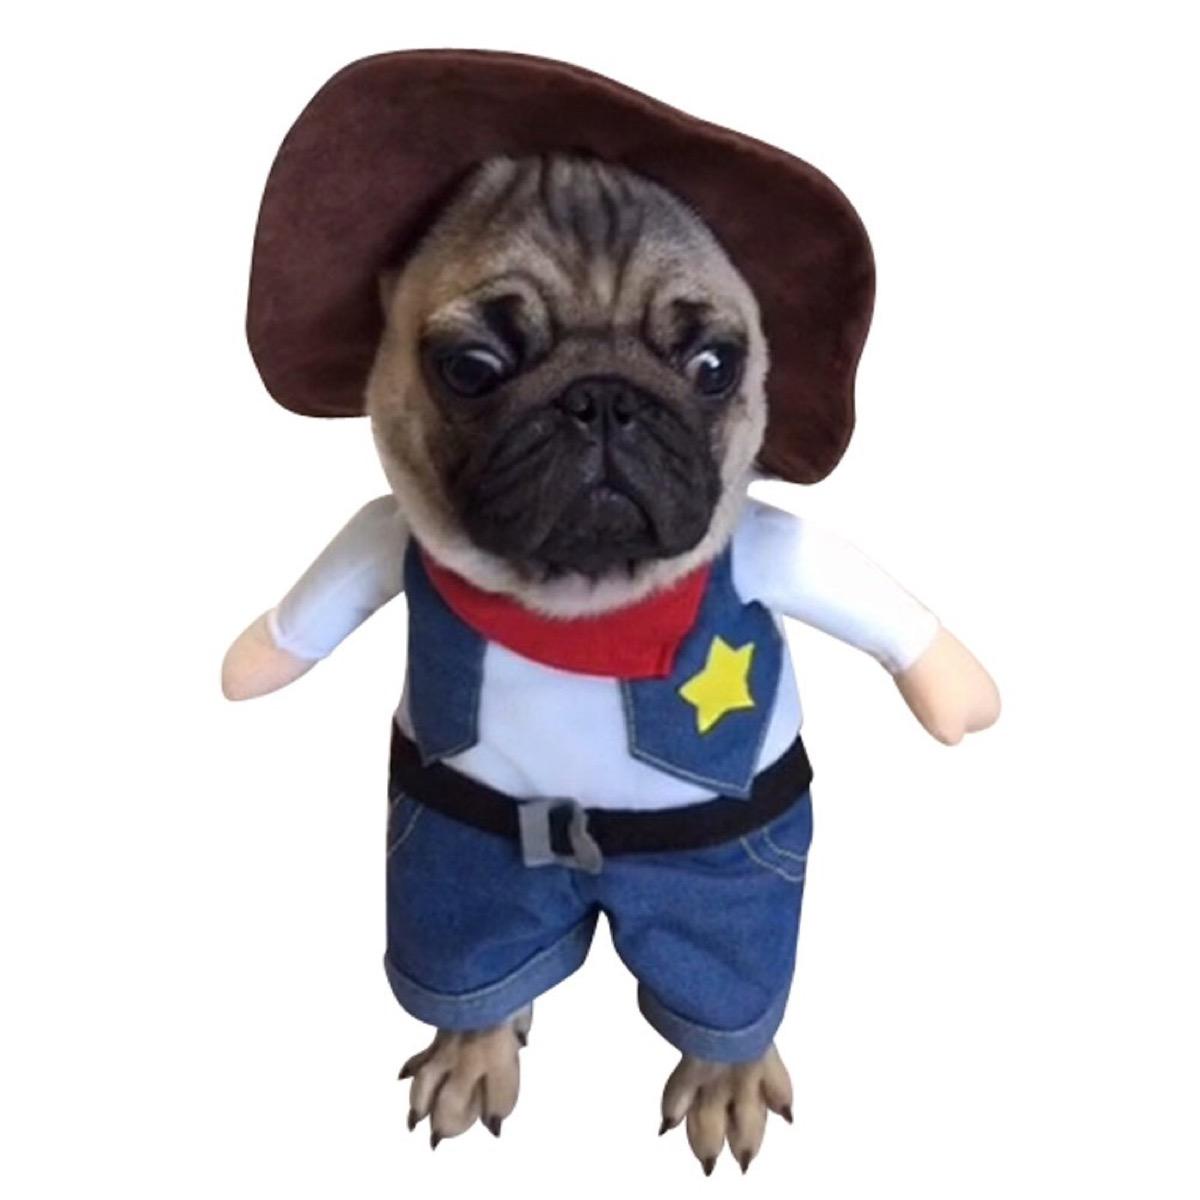 dog cowboy costume, dog halloween costumes